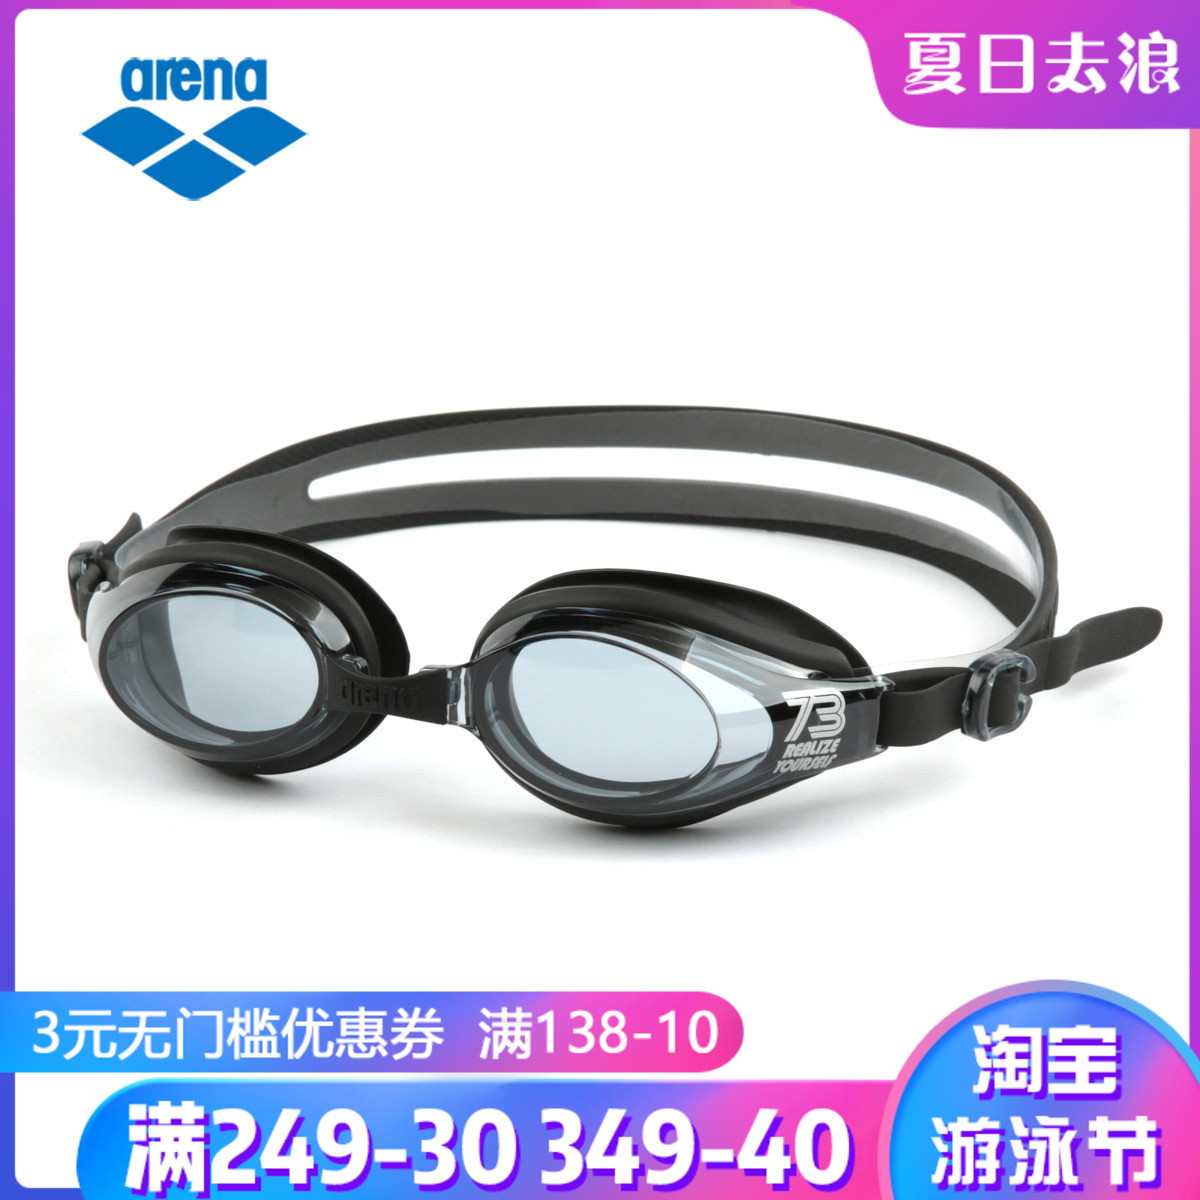 Arena阿瑞娜防霧泳鏡防水泳鏡訓練款泳鏡進口泳鏡正品男女AGY-620